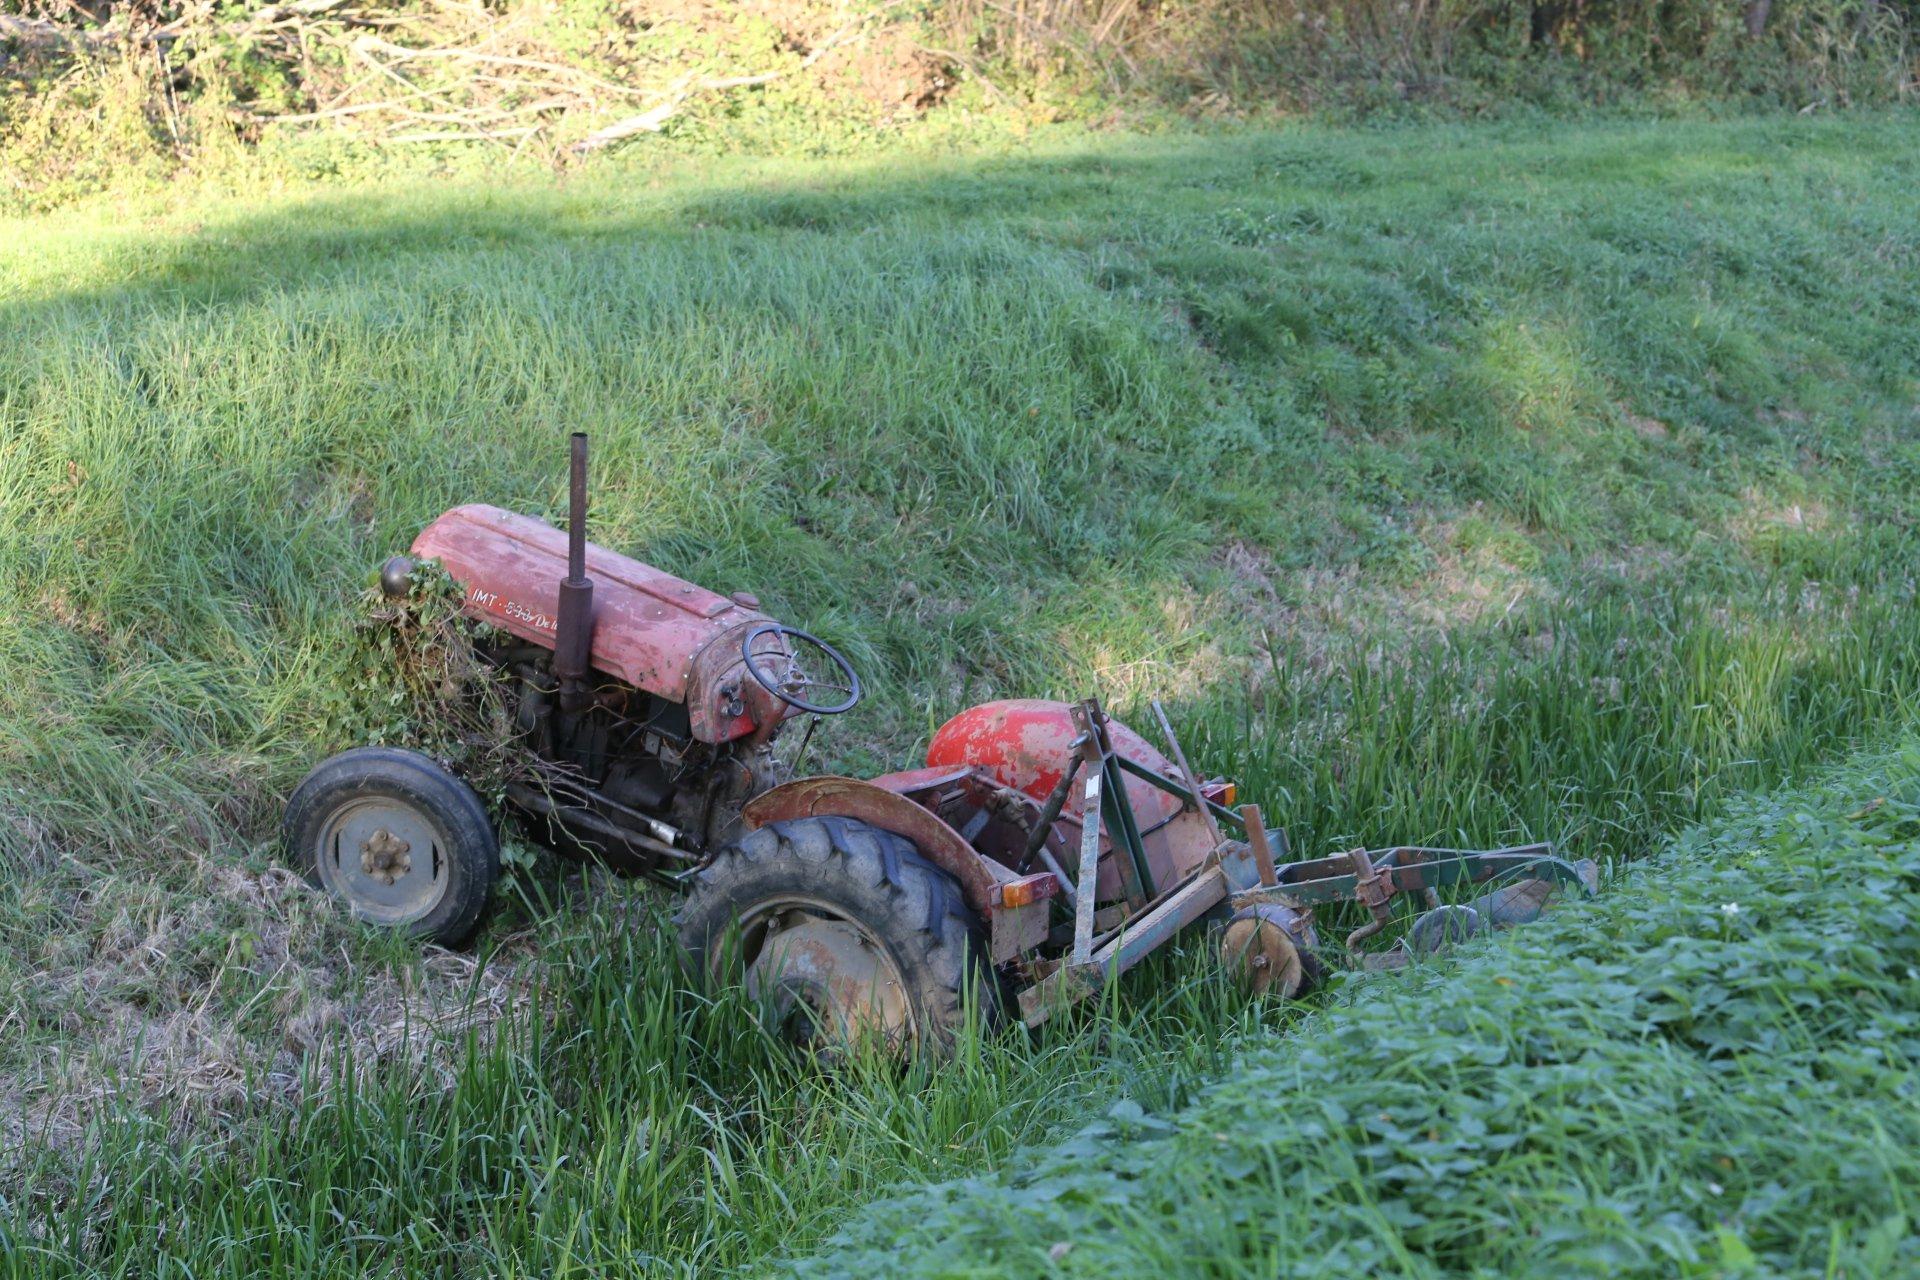 poginuo traktorista polje Celine-Ferketinec